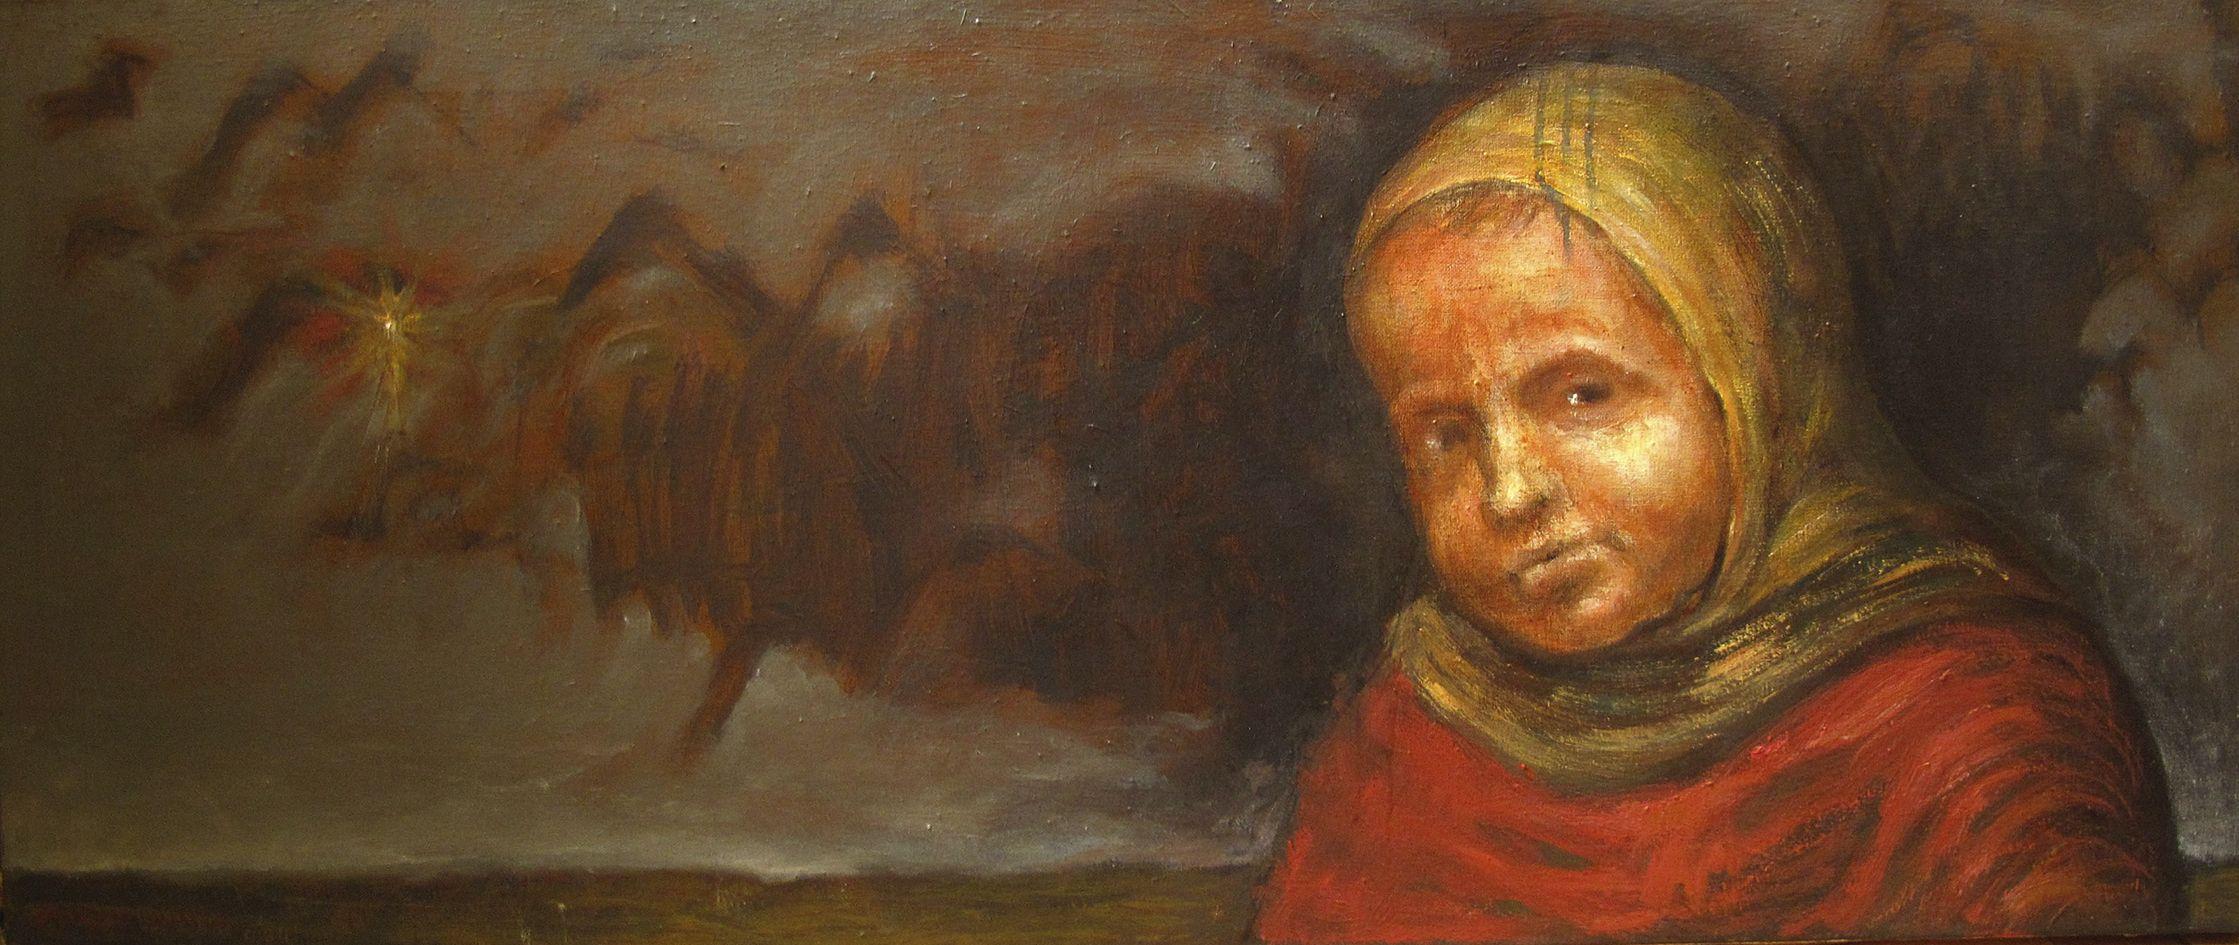 Петро Гуменюк. Без назви, 2011; полотно, олія